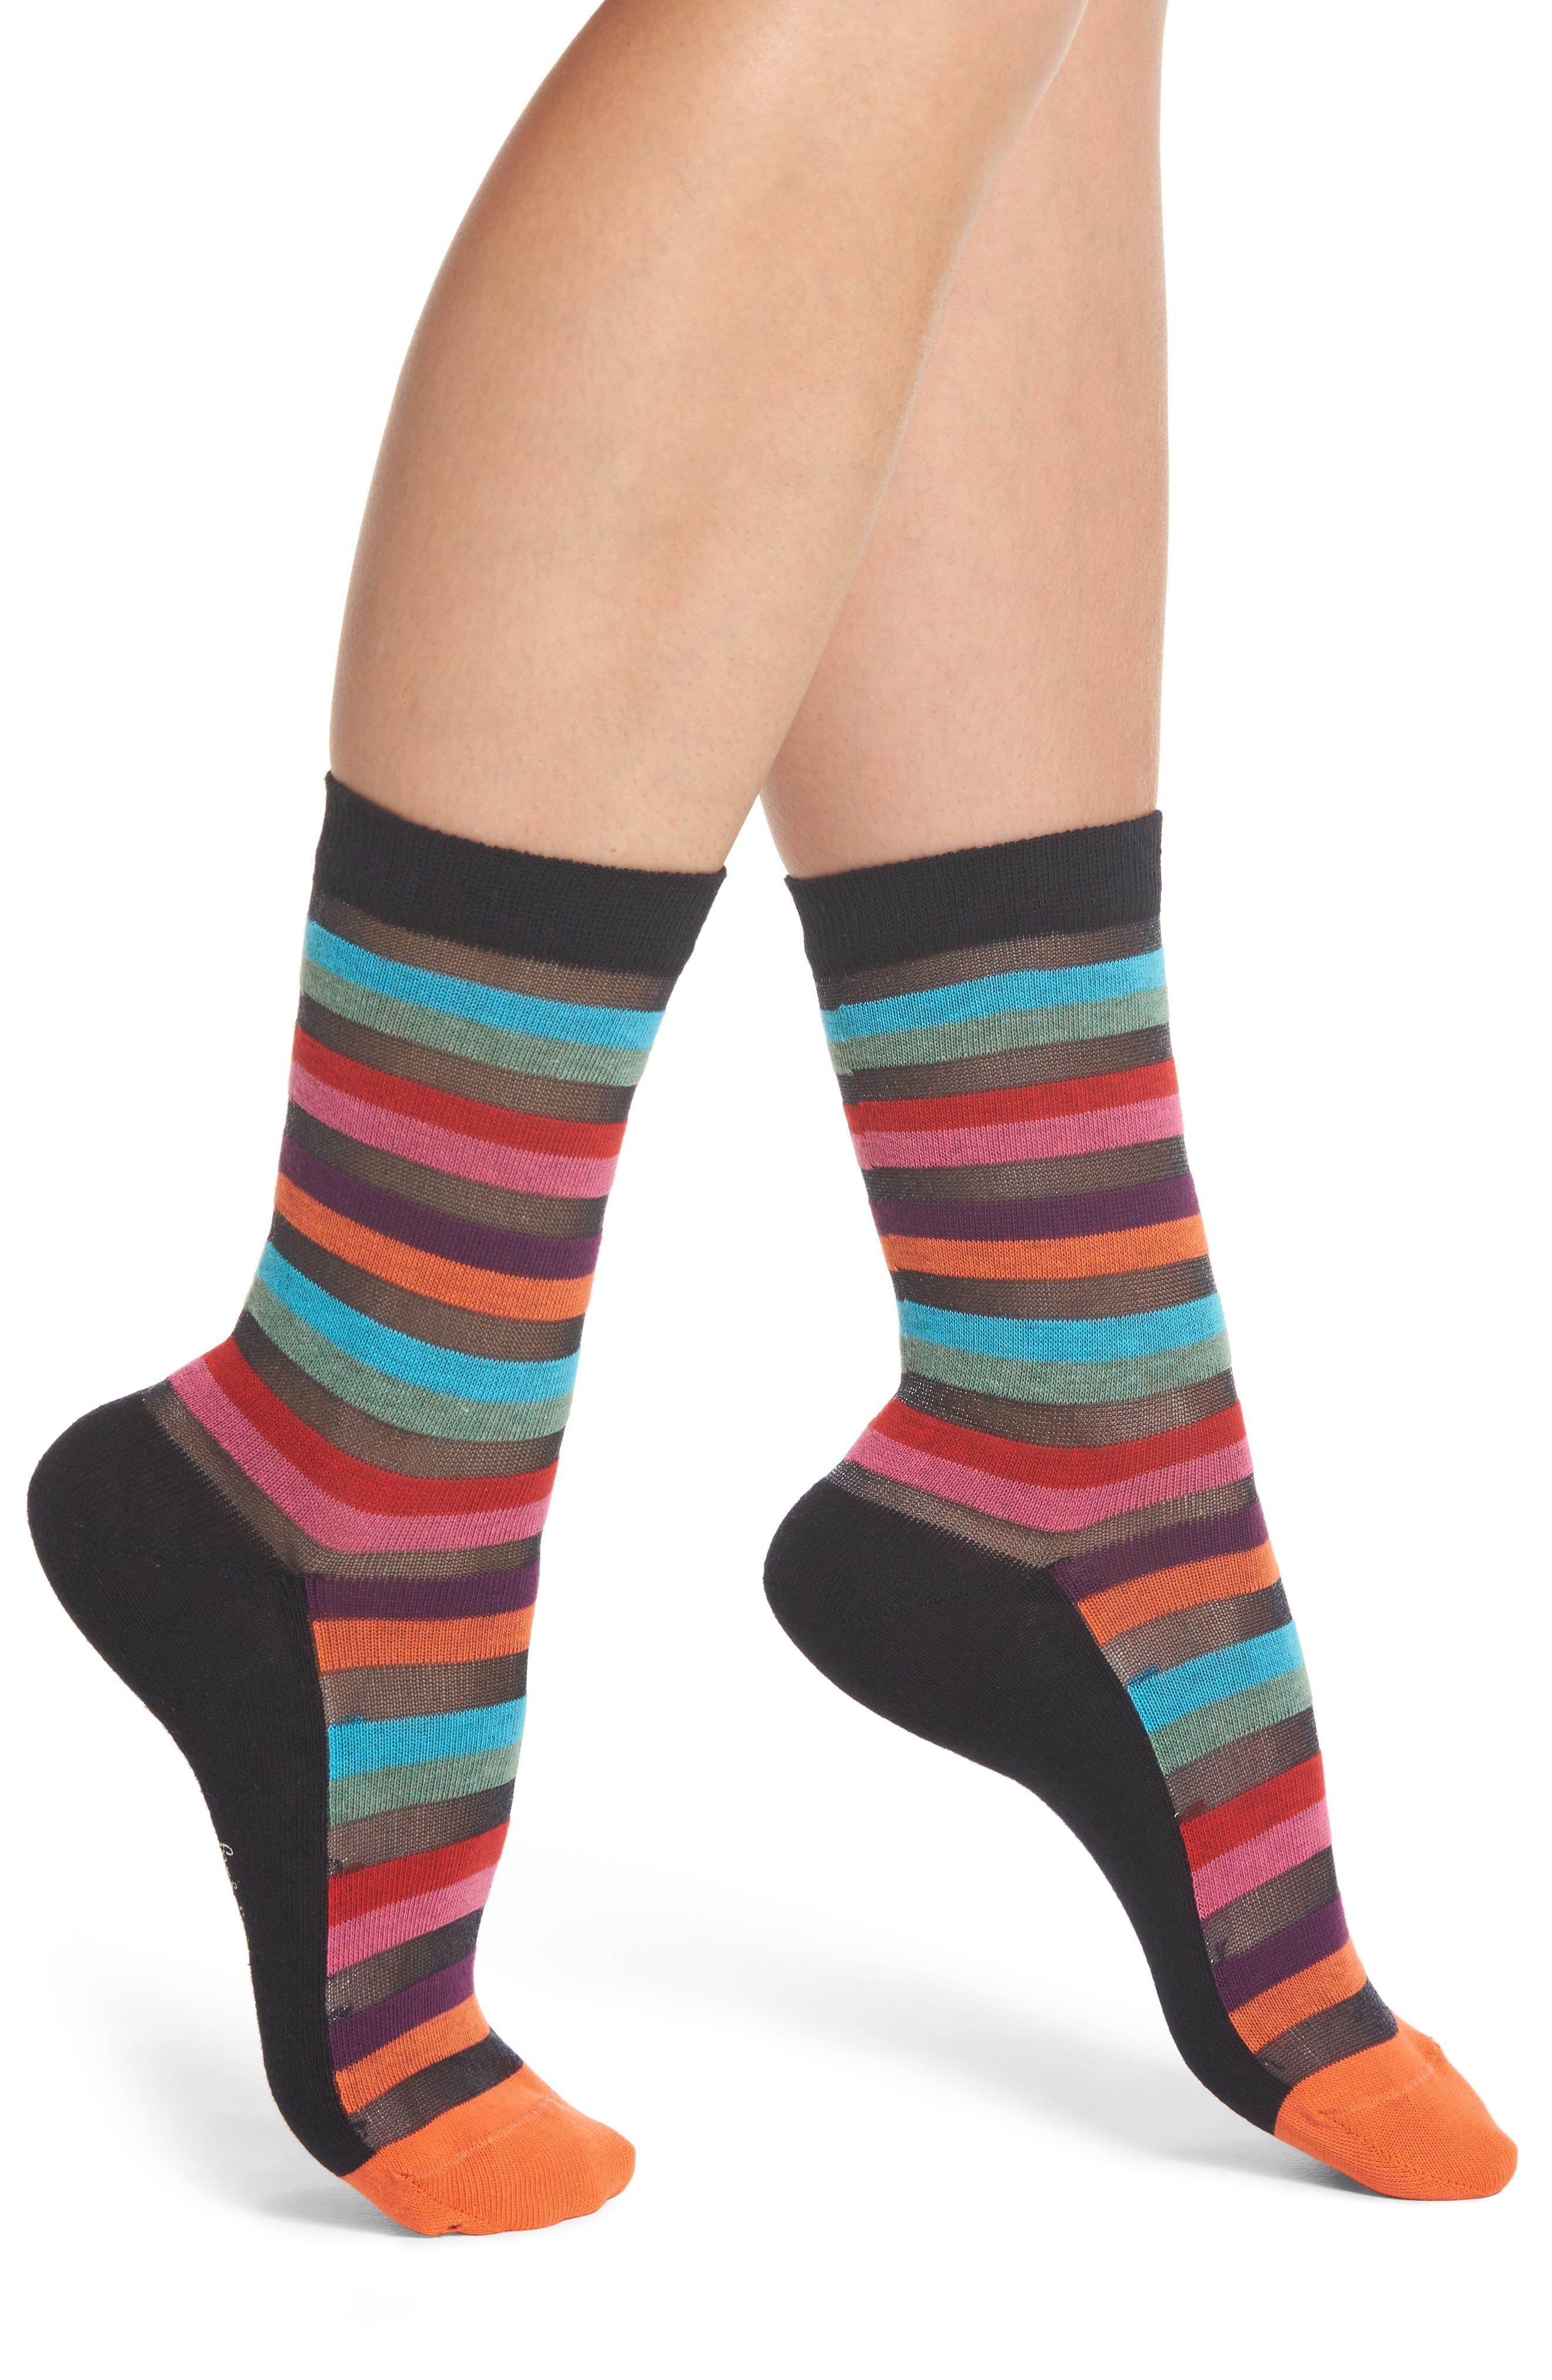 Felicity Rainbow Socks,                             Main thumbnail 1, color,                             Black Multi